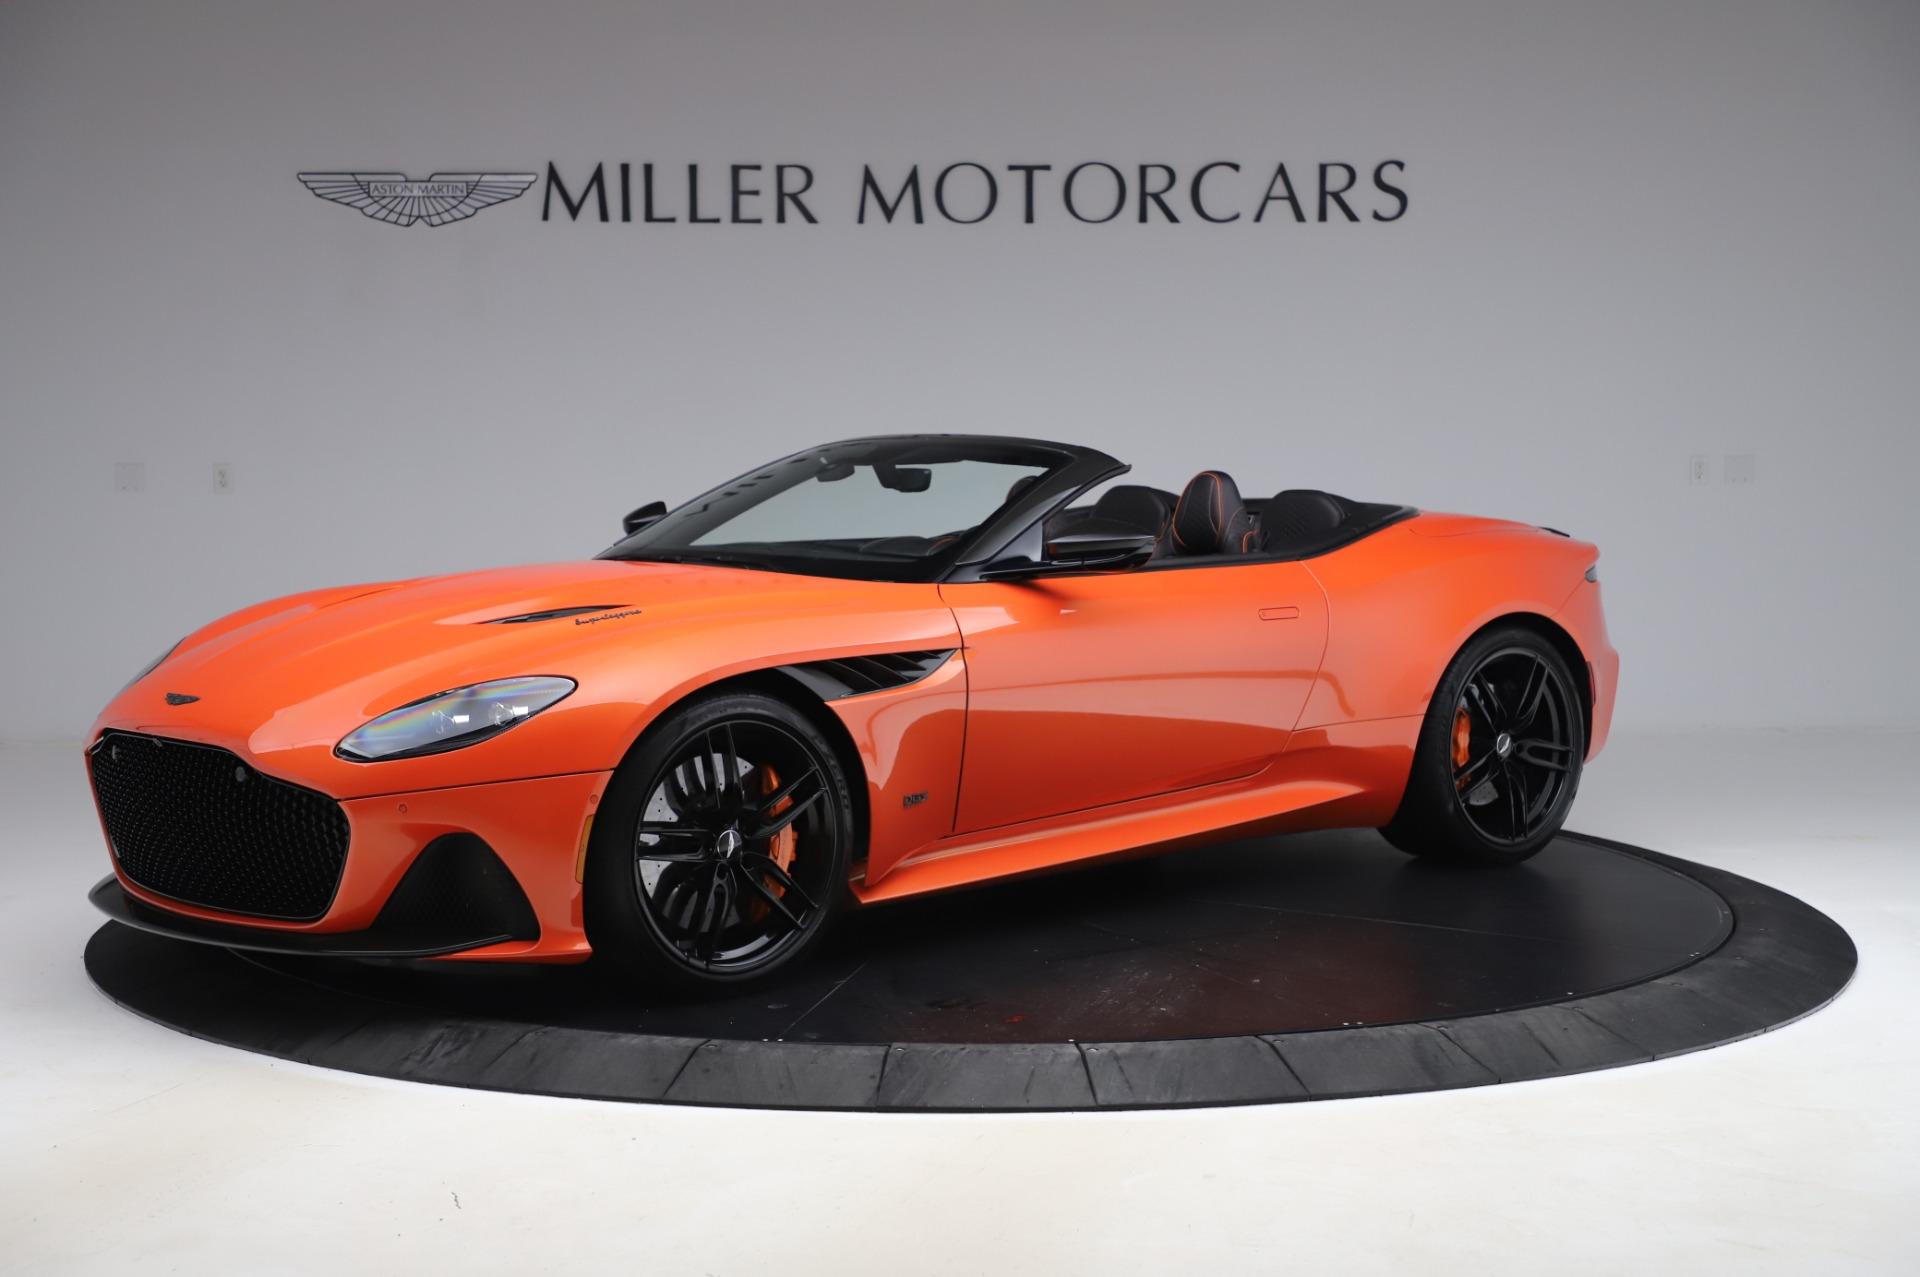 Used 2020 Aston Martin DBS Superleggera Volante for sale Sold at Pagani of Greenwich in Greenwich CT 06830 1